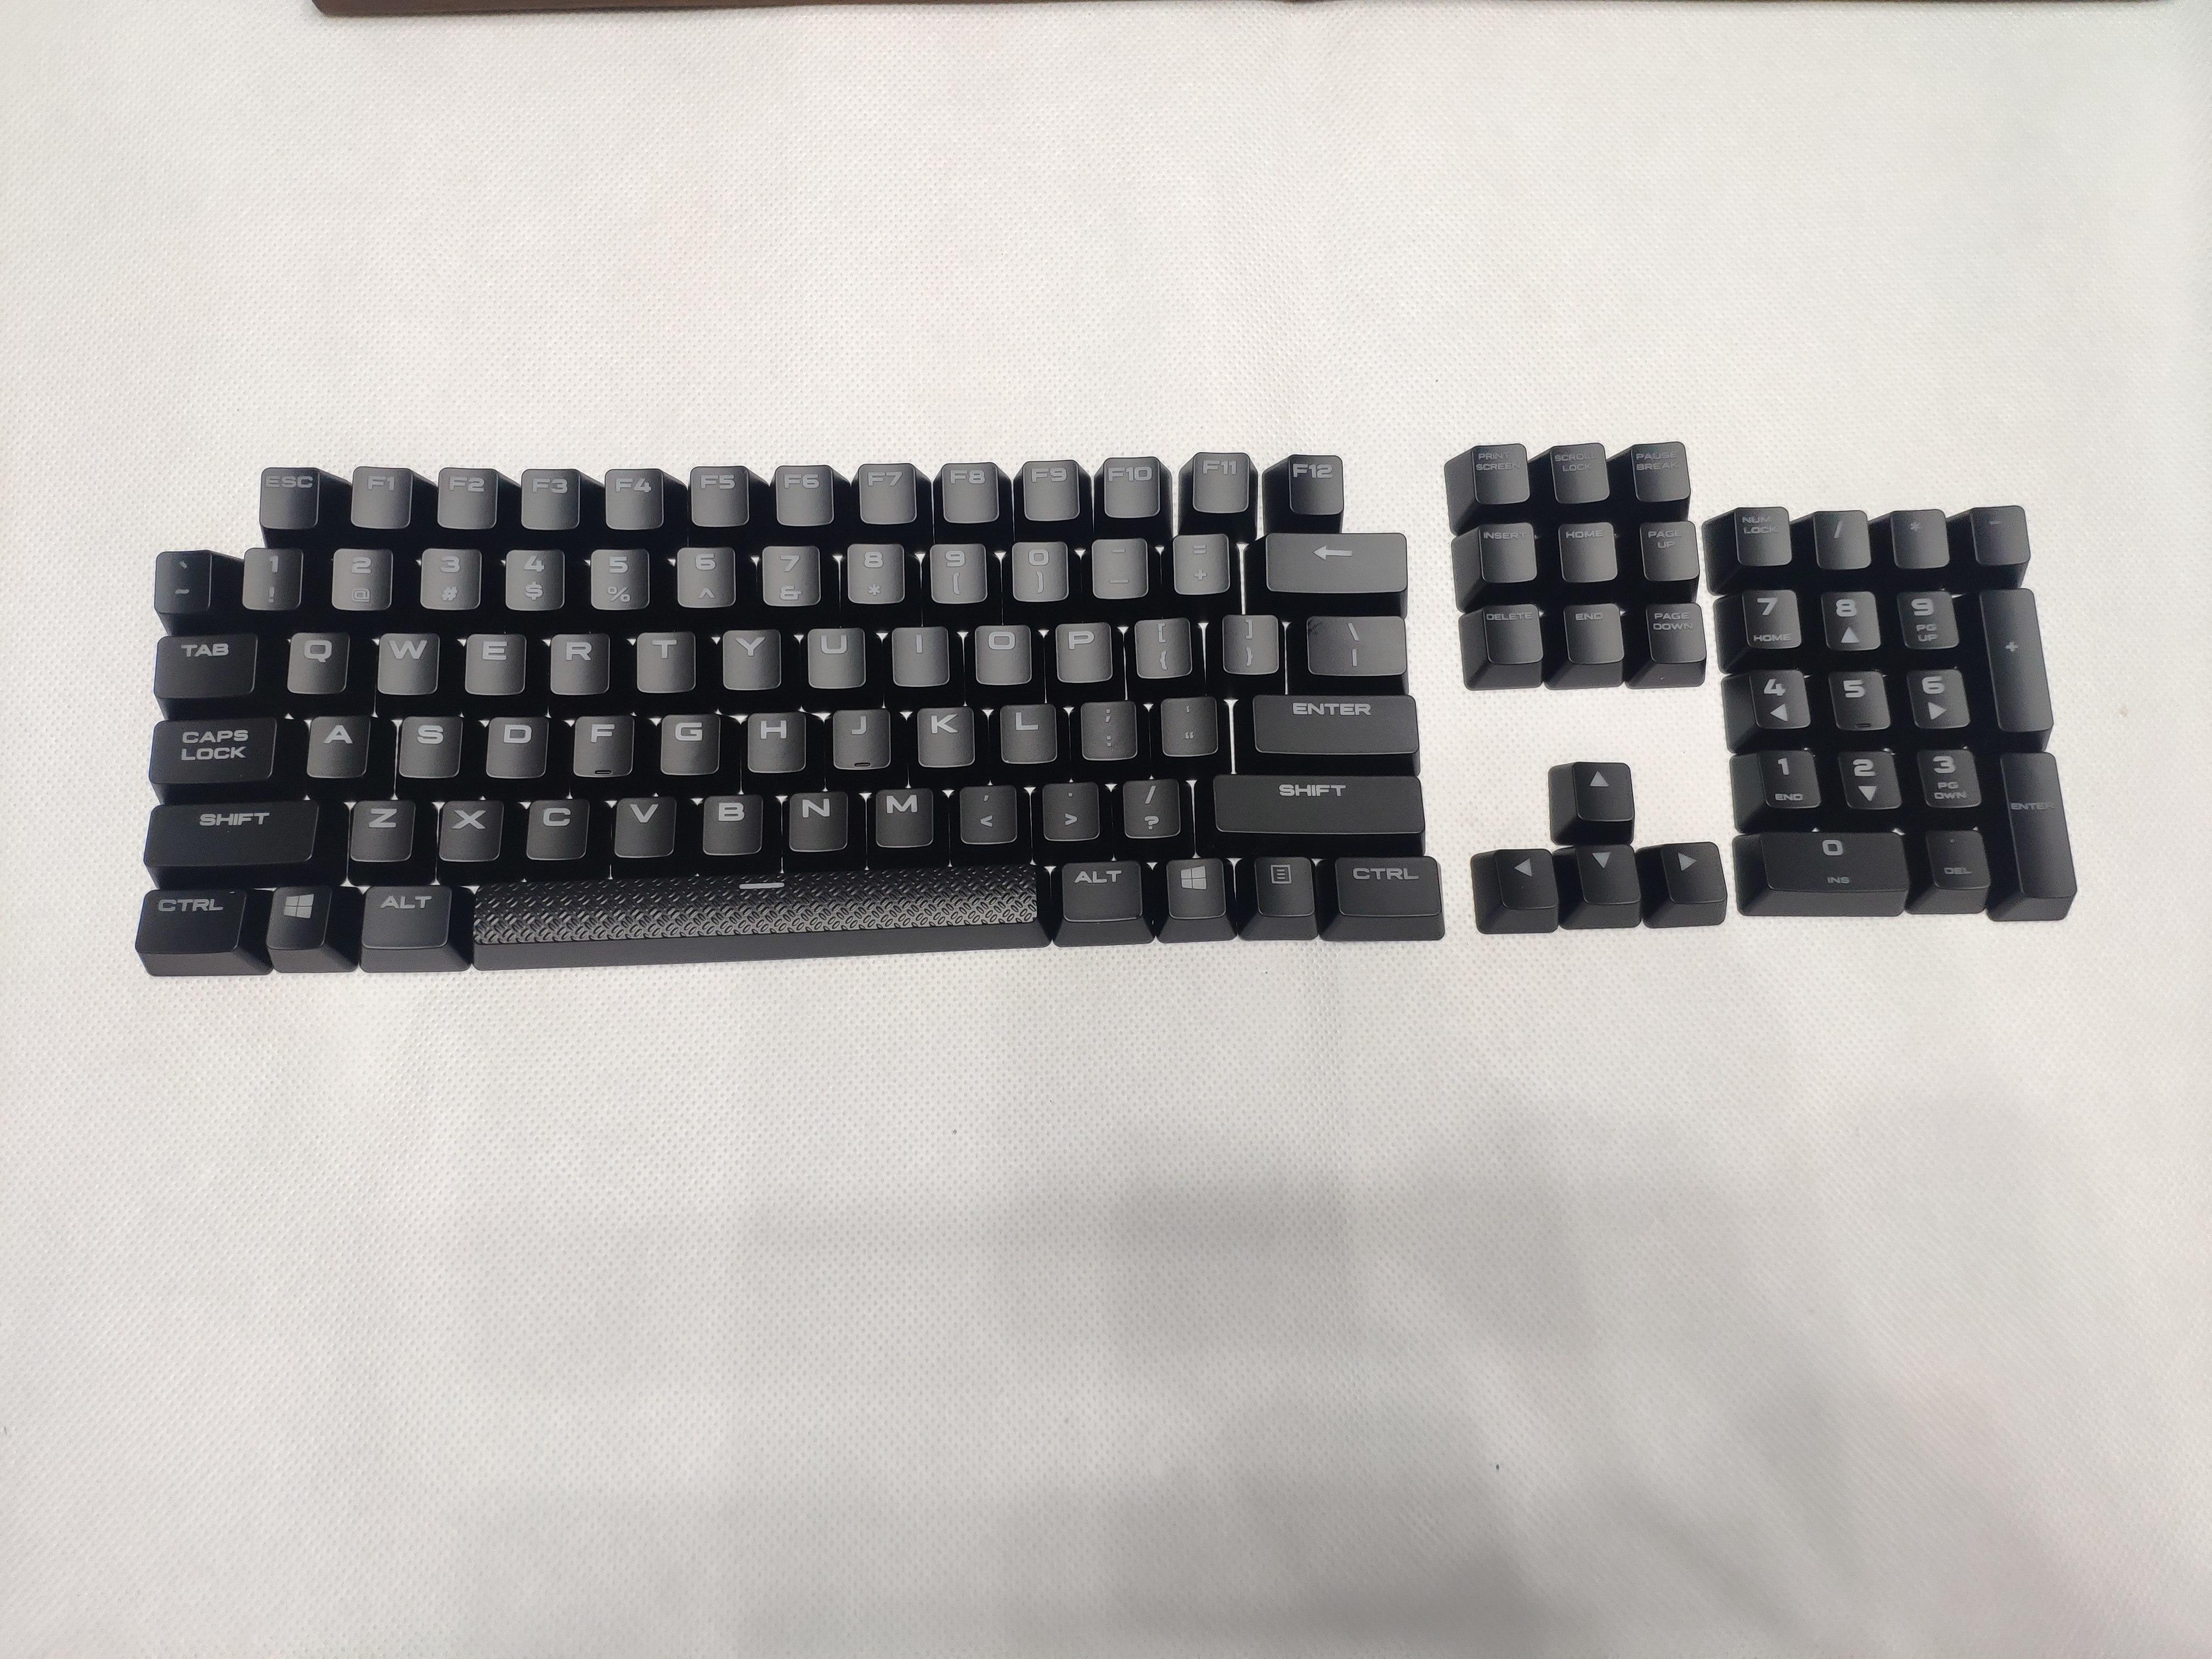 Original key caps for CORSAIR mechanical keyboard K70 LUX/K70 LUX RGB/K95 single key cap can be sold(China)